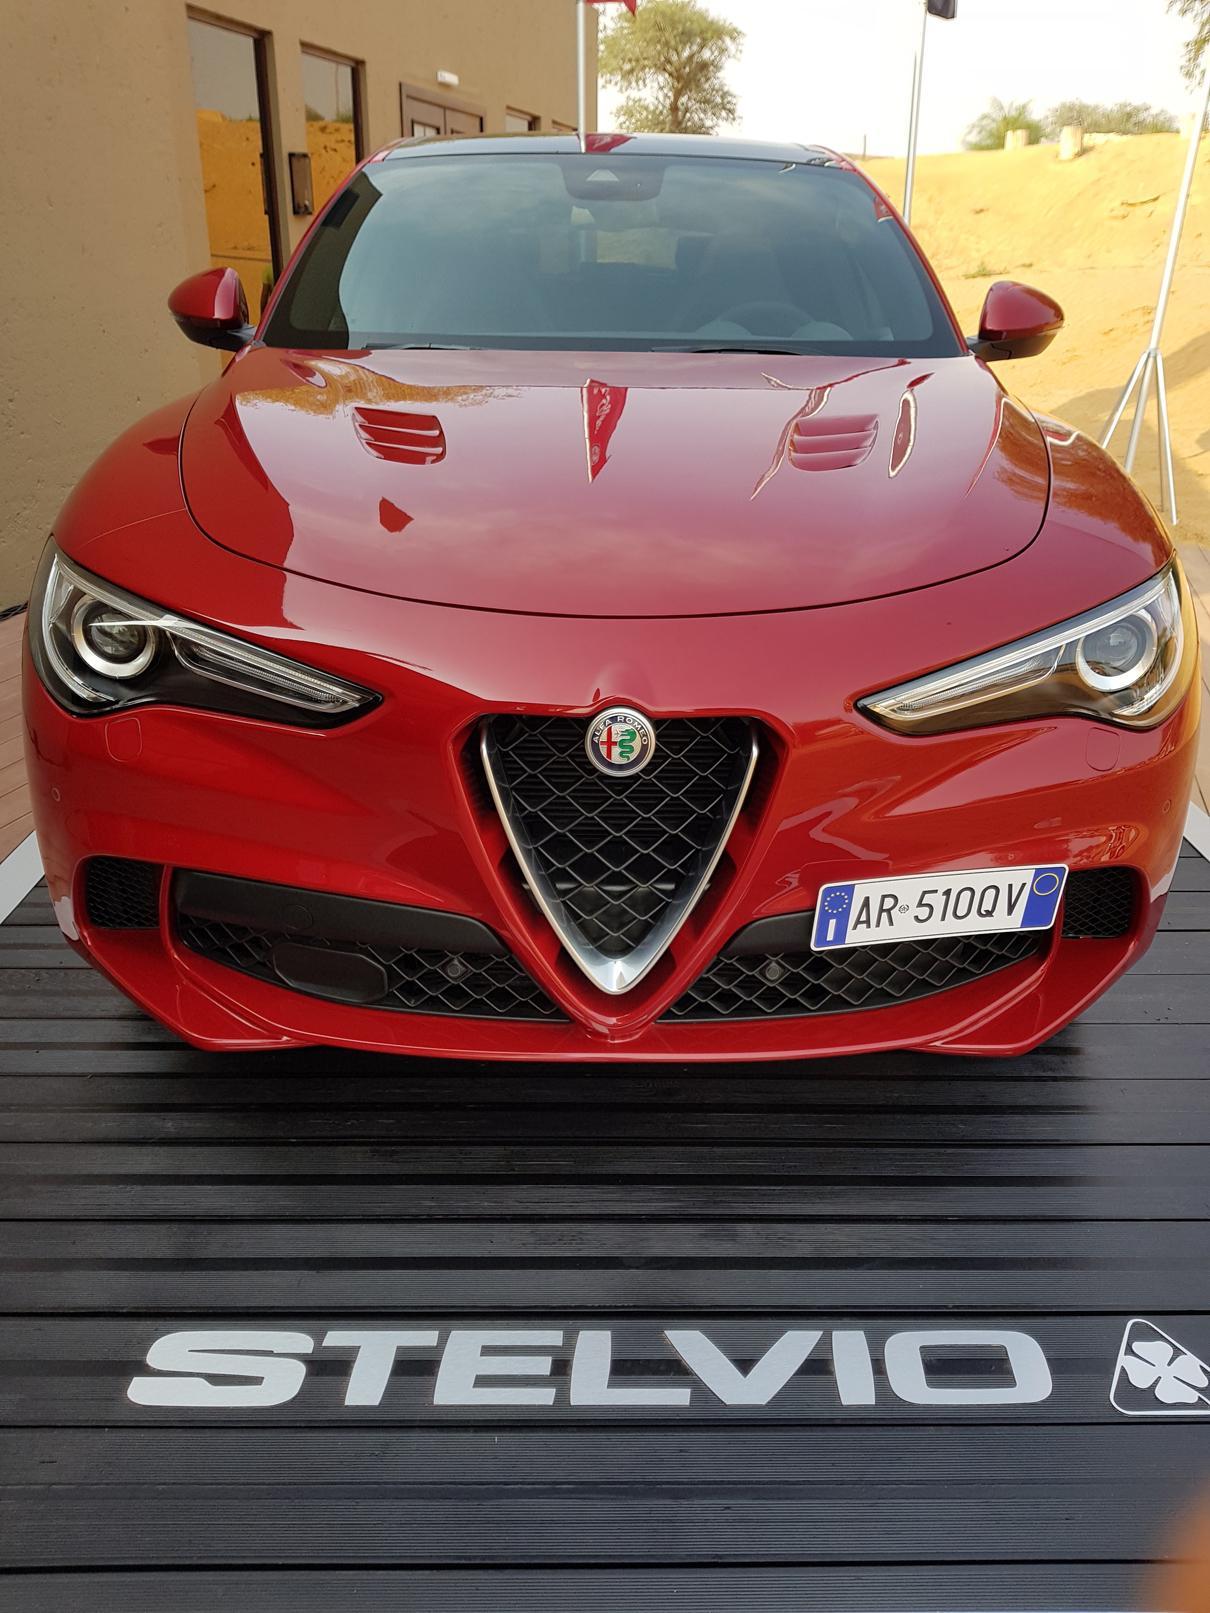 Lancio della nuova Alfa Stelvio a Dubai